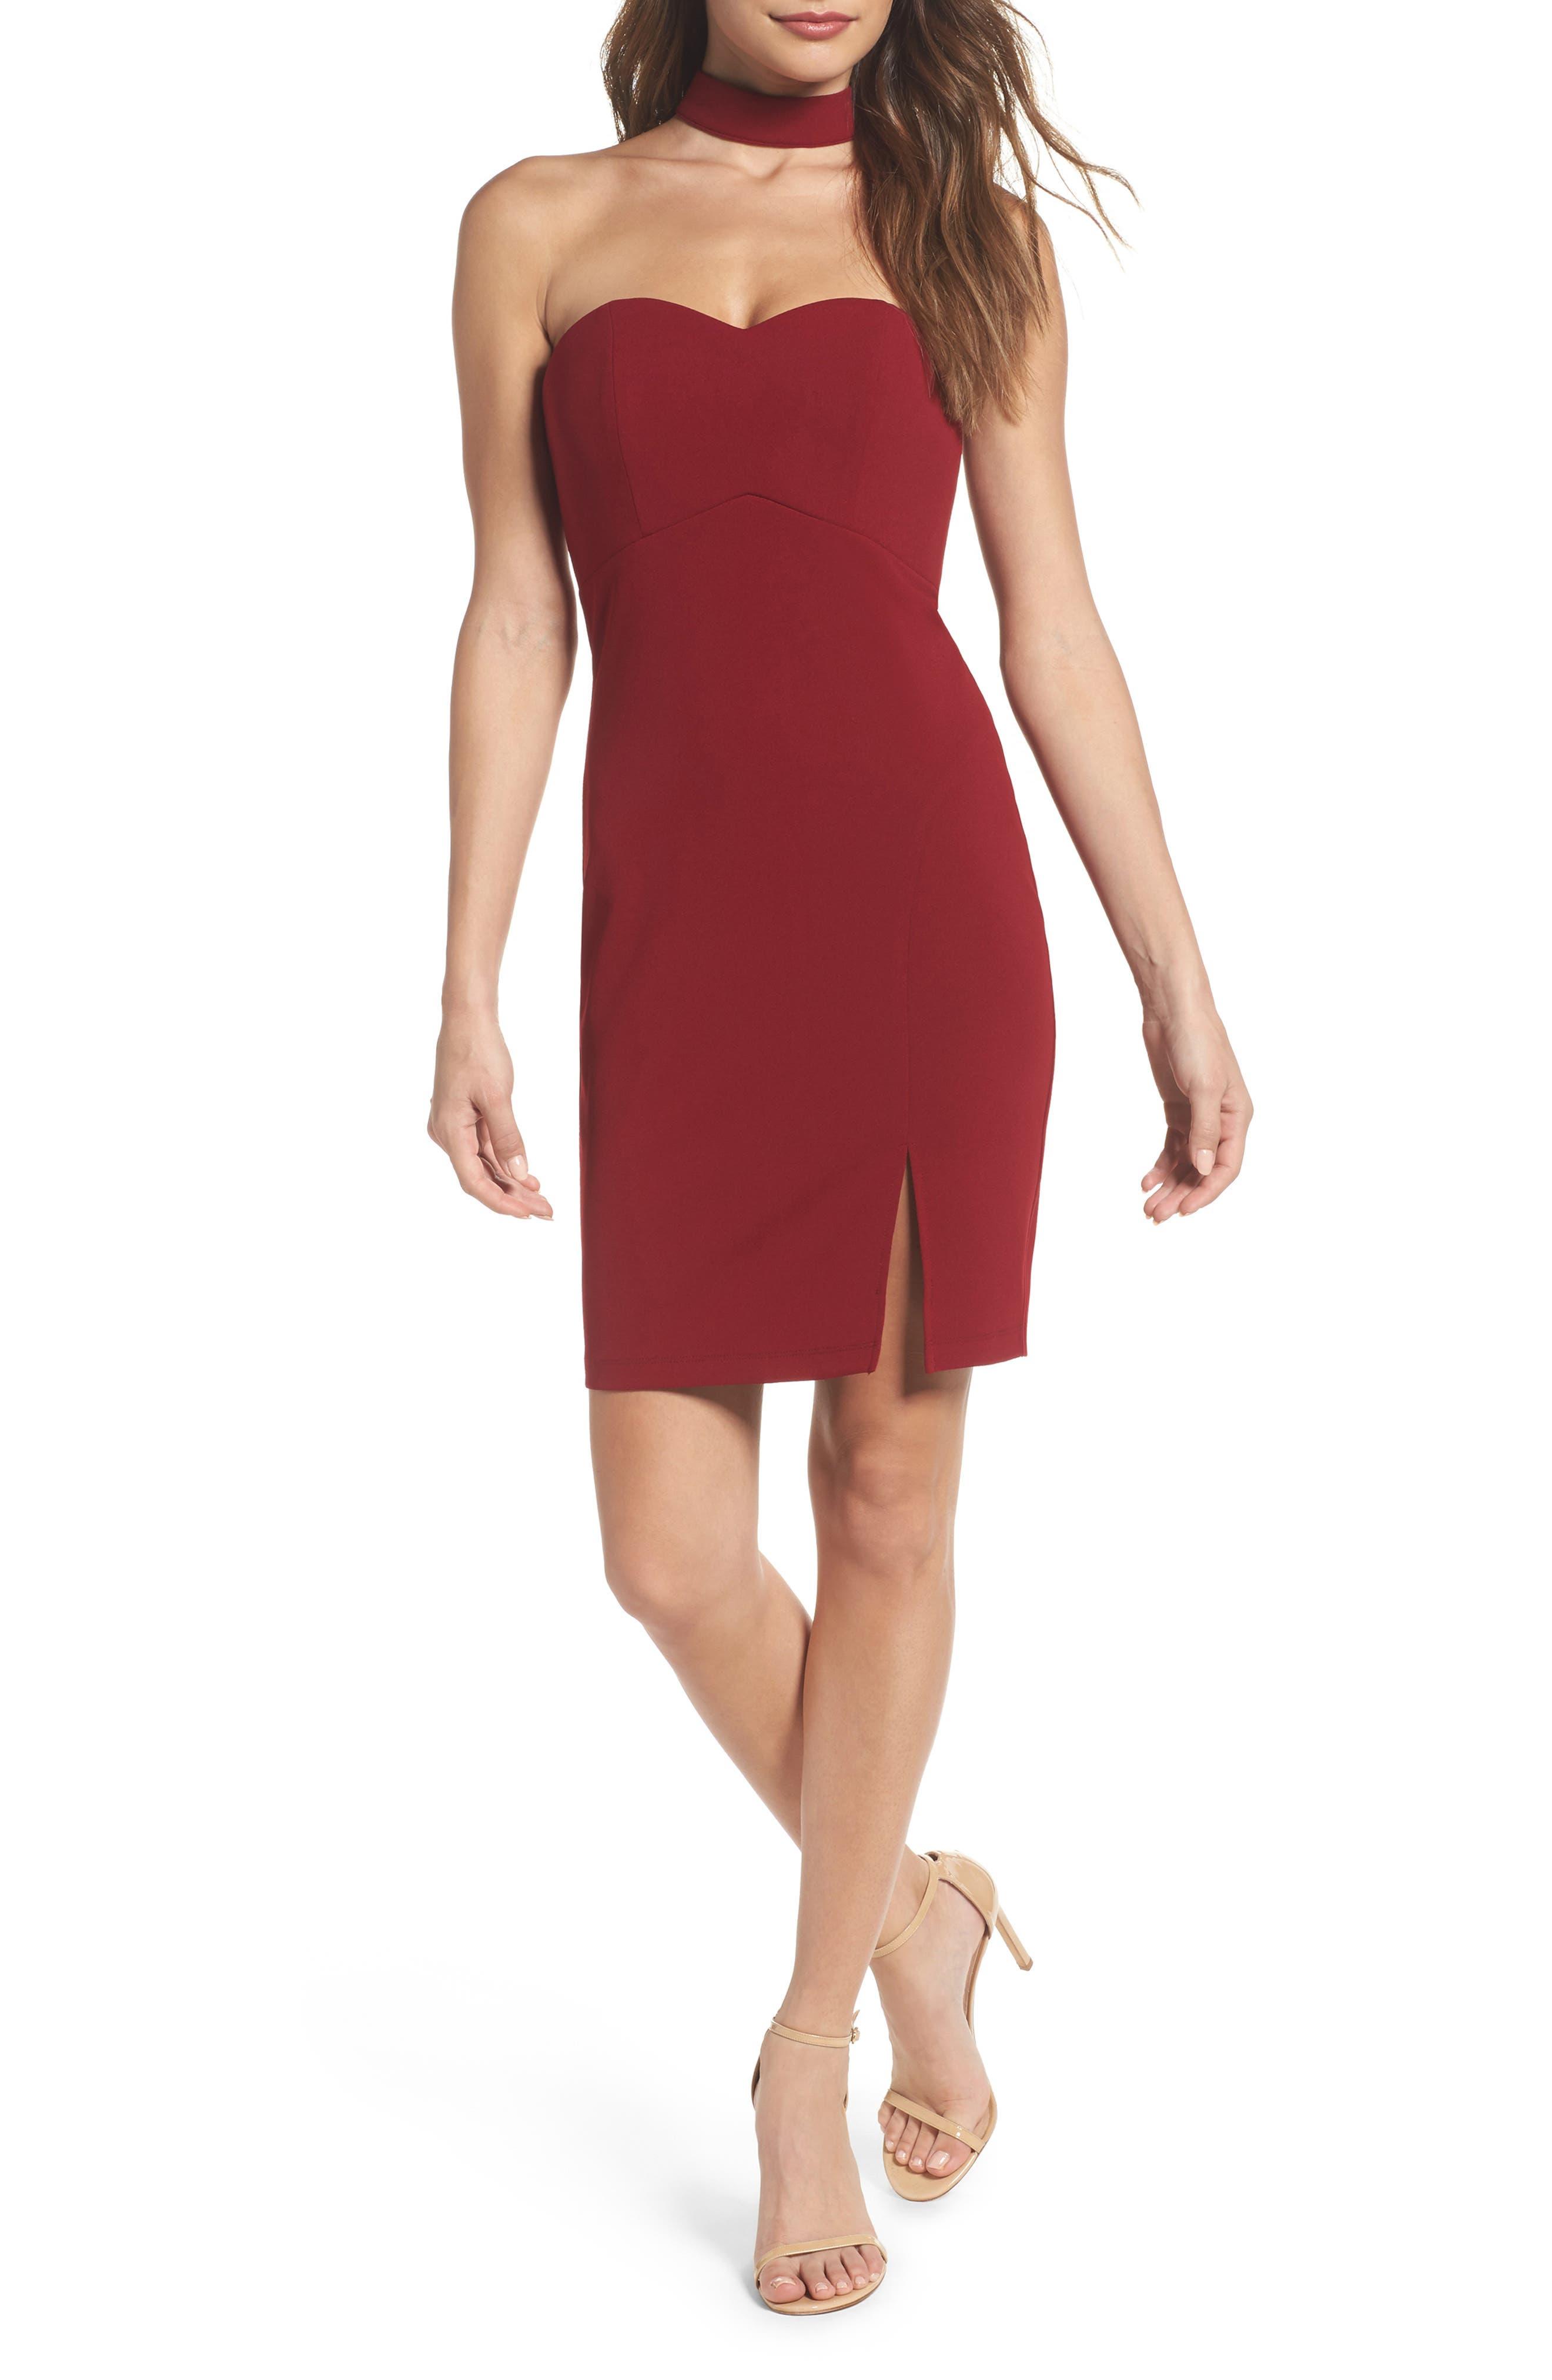 Main Image - Sequin Hearts Choker Neck Body-Con Dress